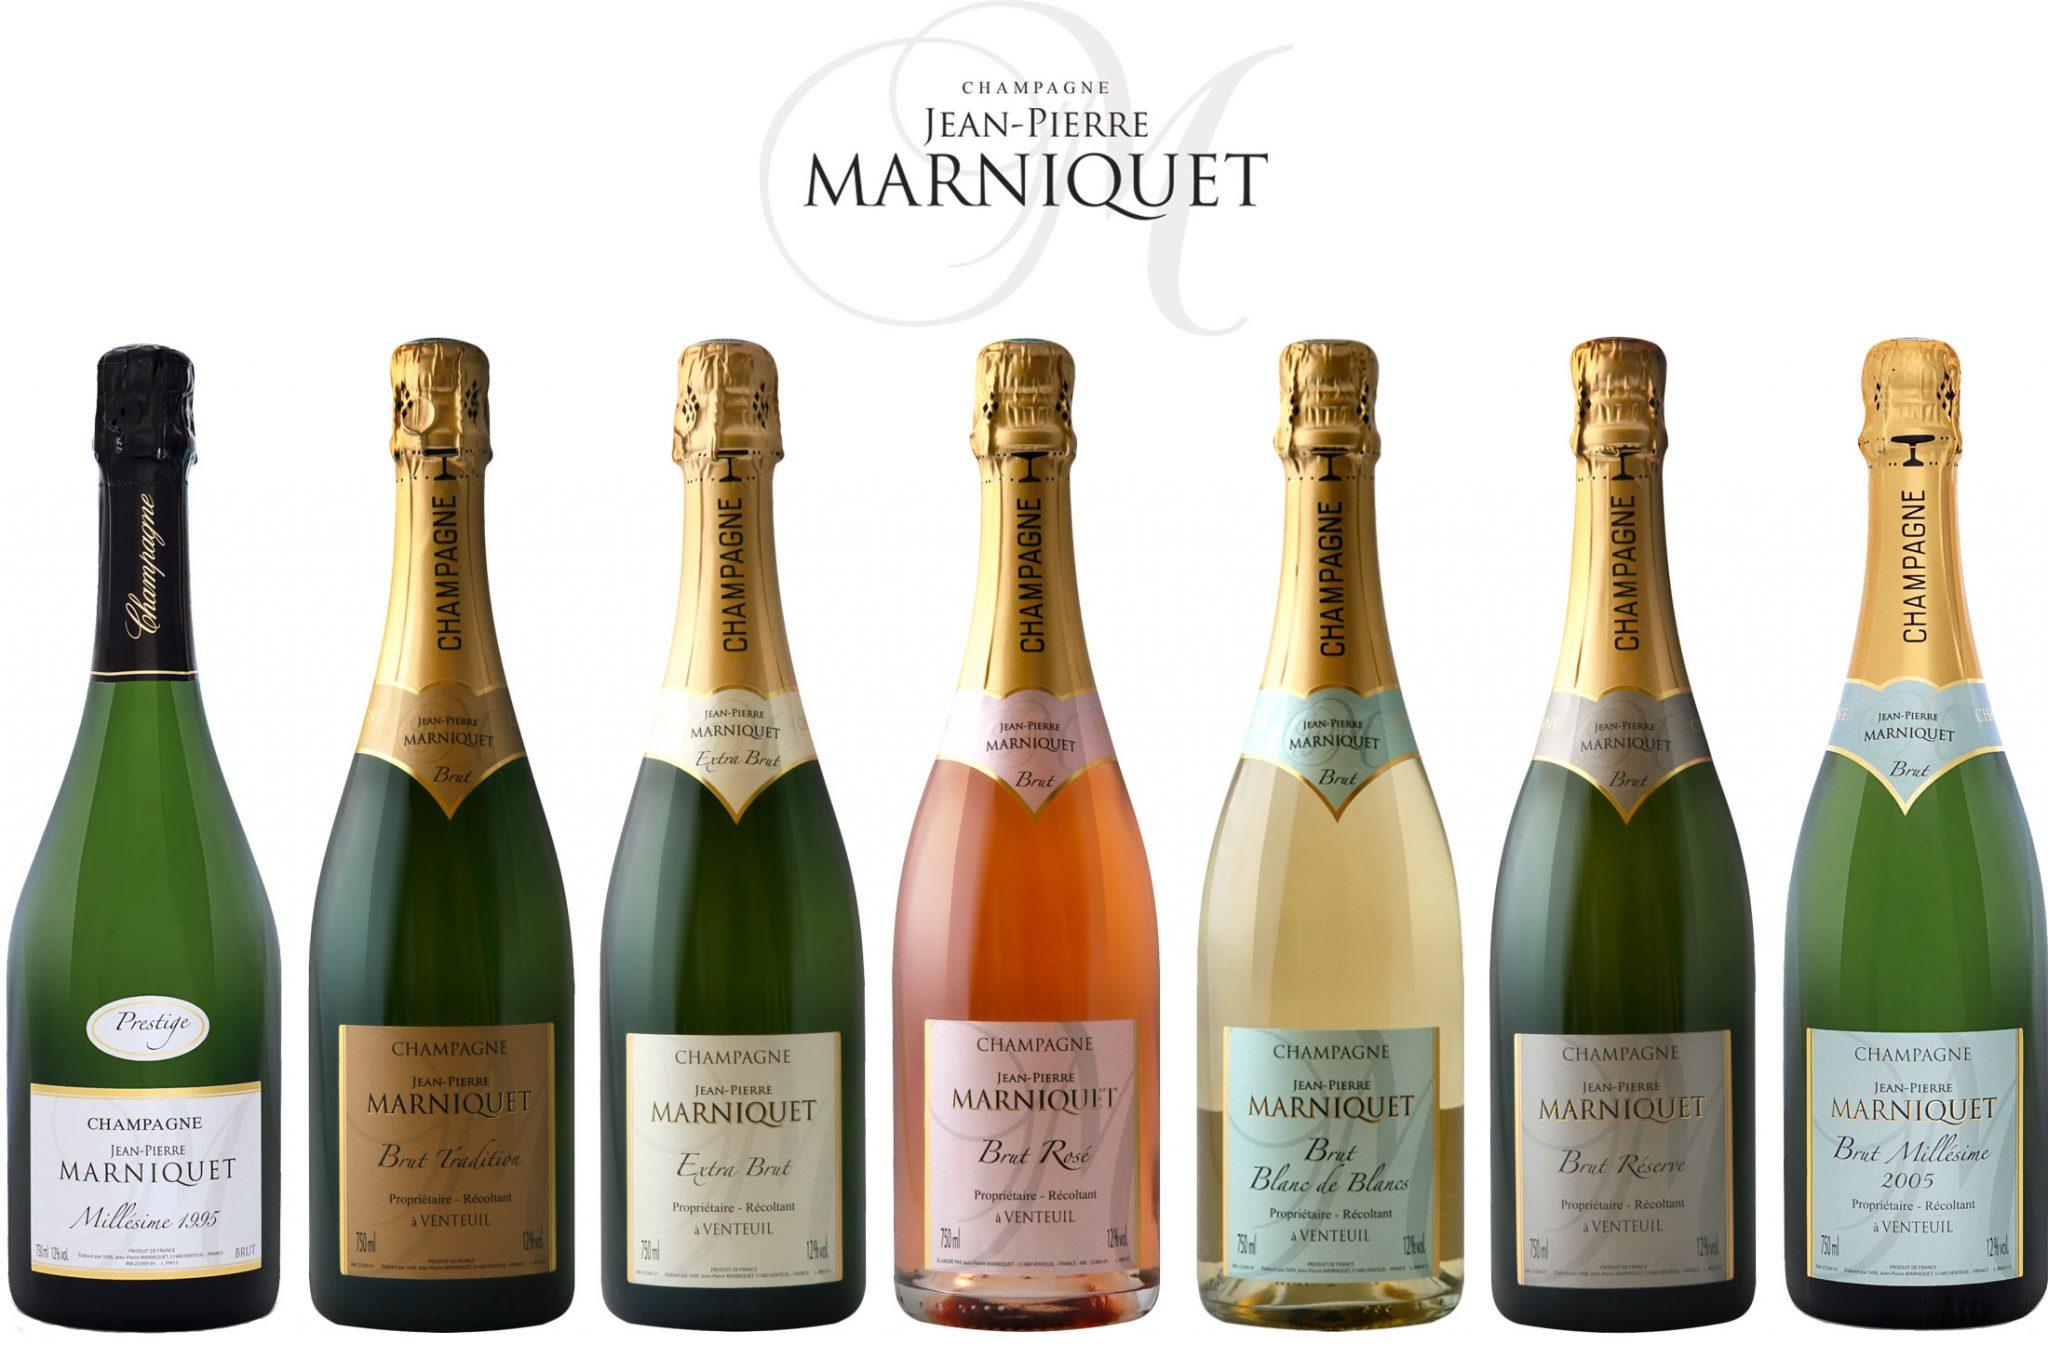 Champagne Jean-Pierre Marniquet